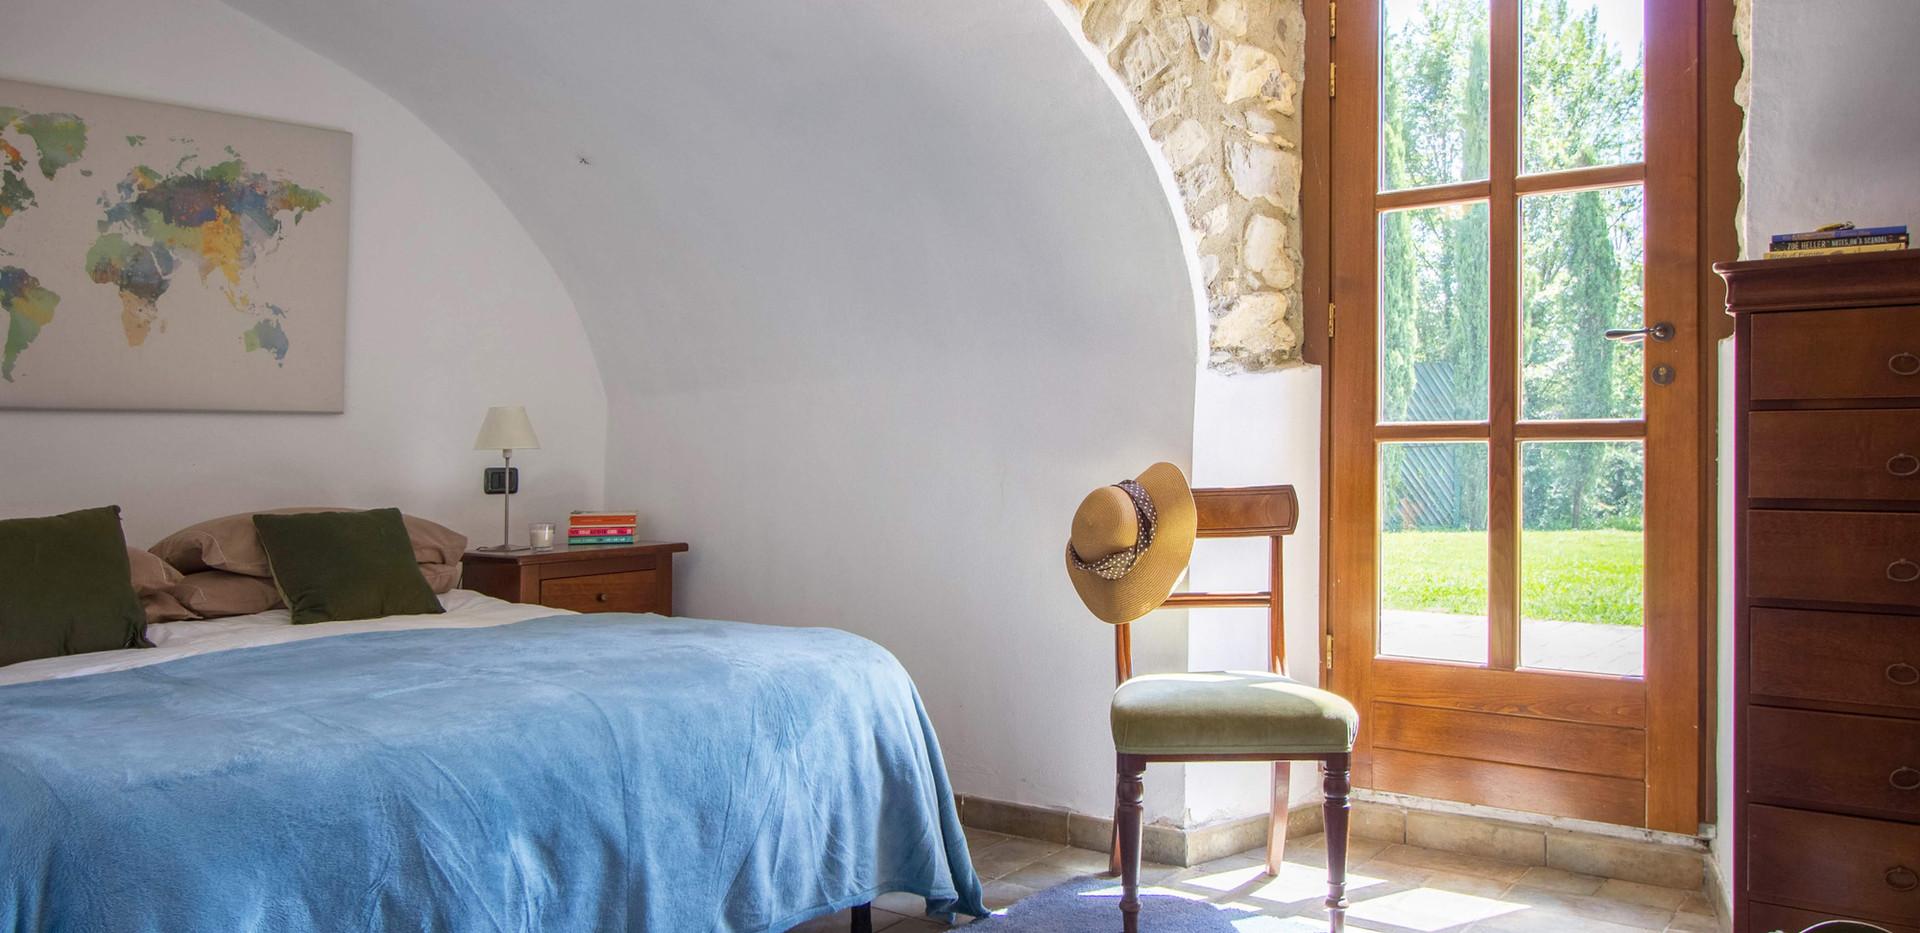 Bedroom 2 Home 15.jpg